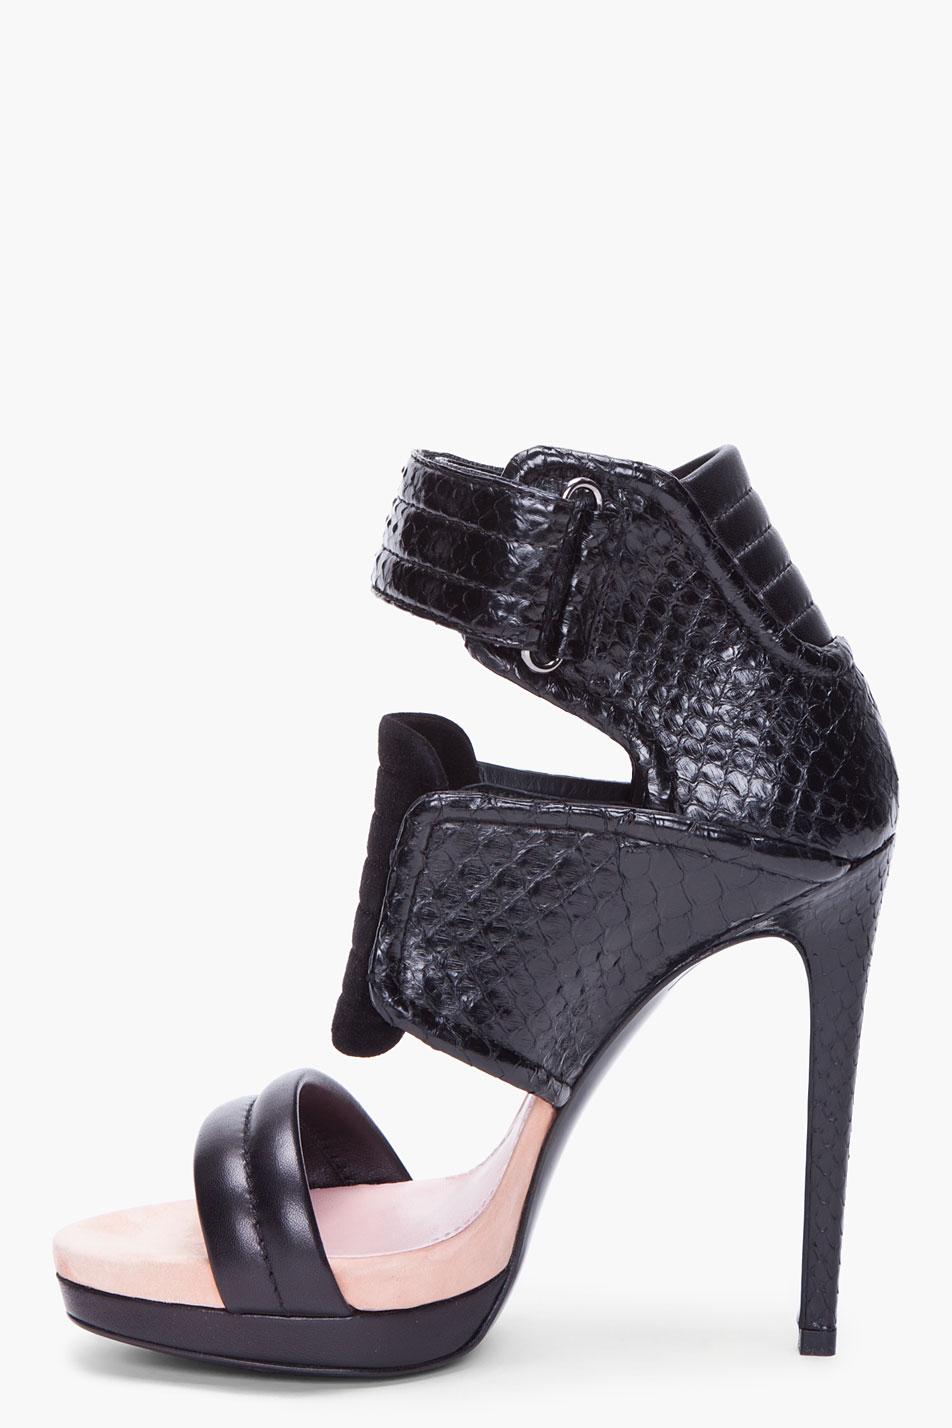 BARBARA BUI Leather High Heel GBM5xU3Yg